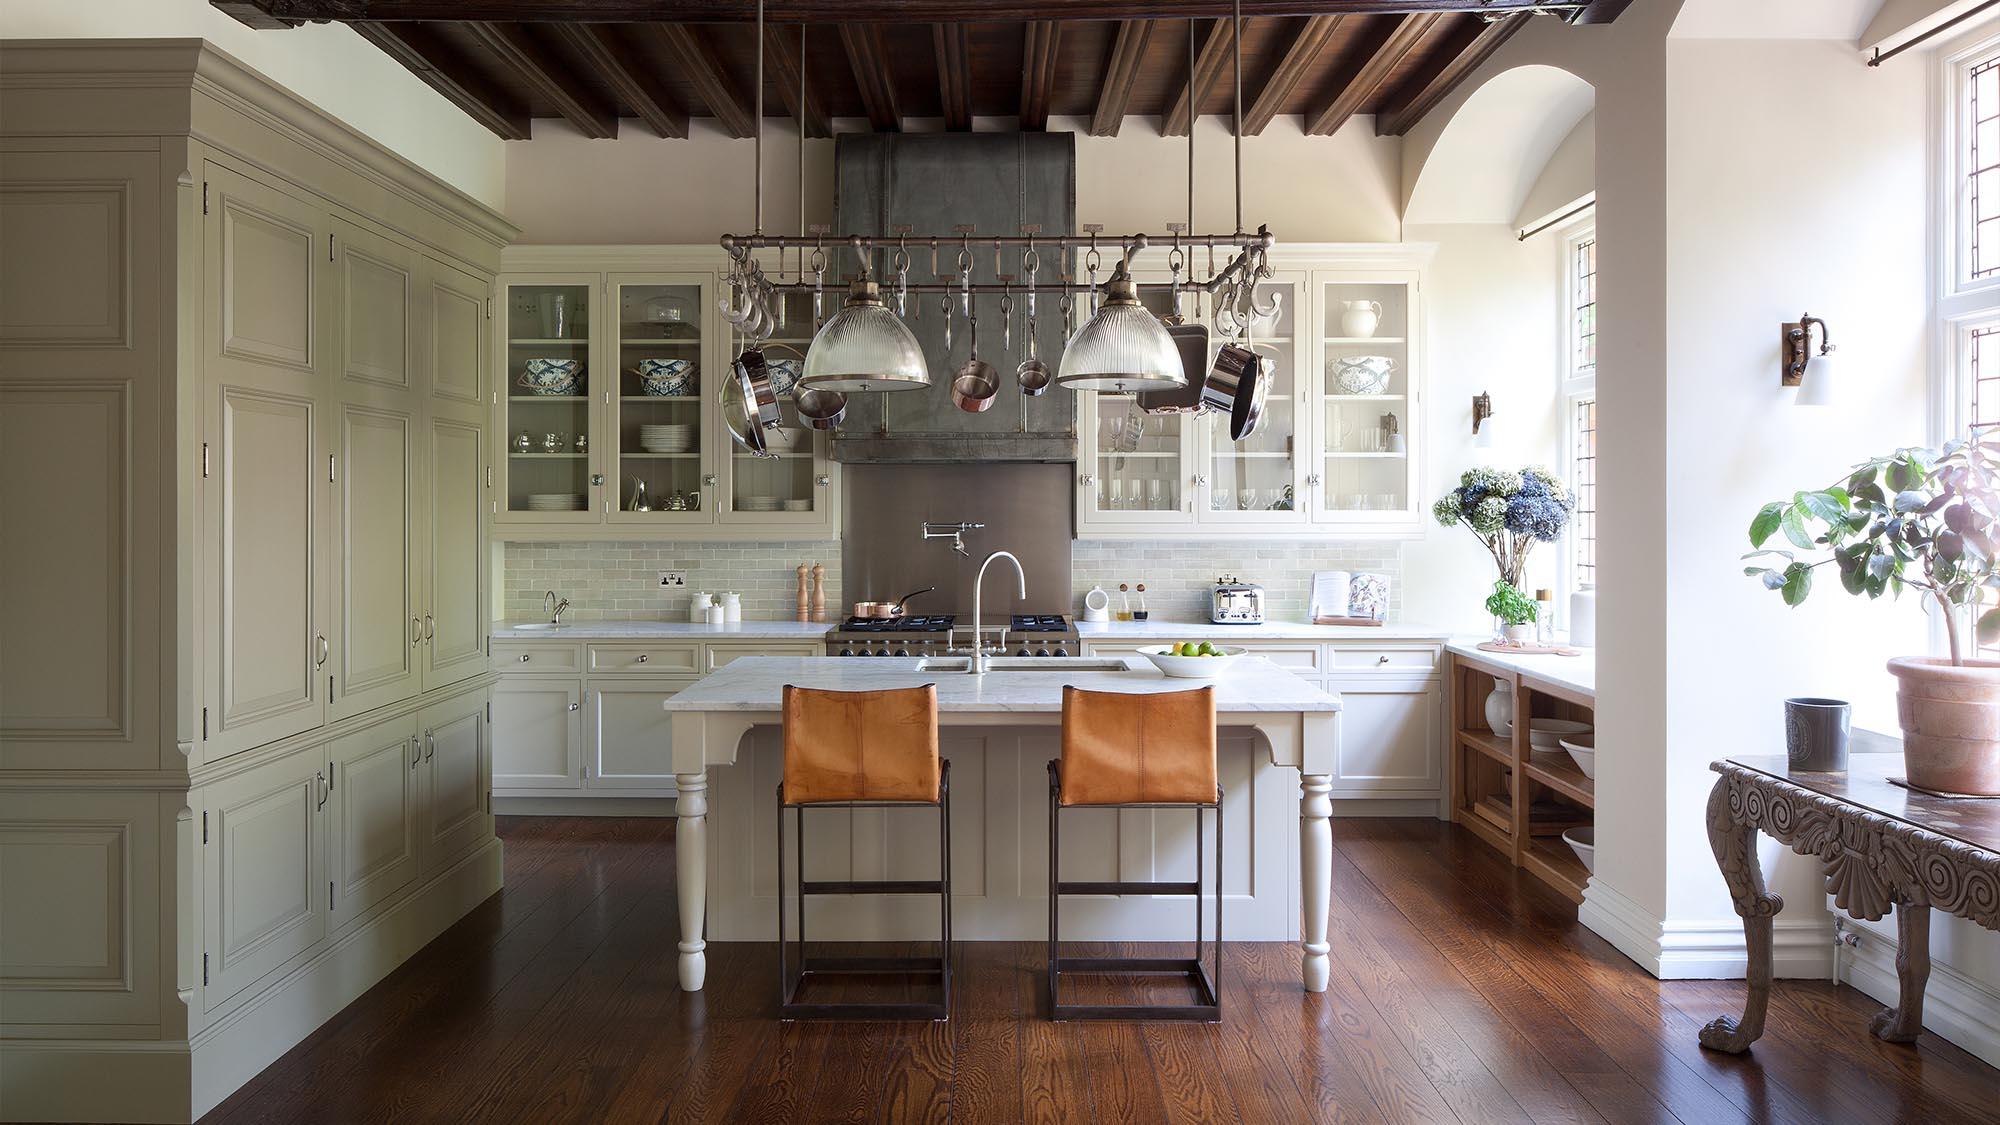 Bespoke Kitchen Design Tips - Header image